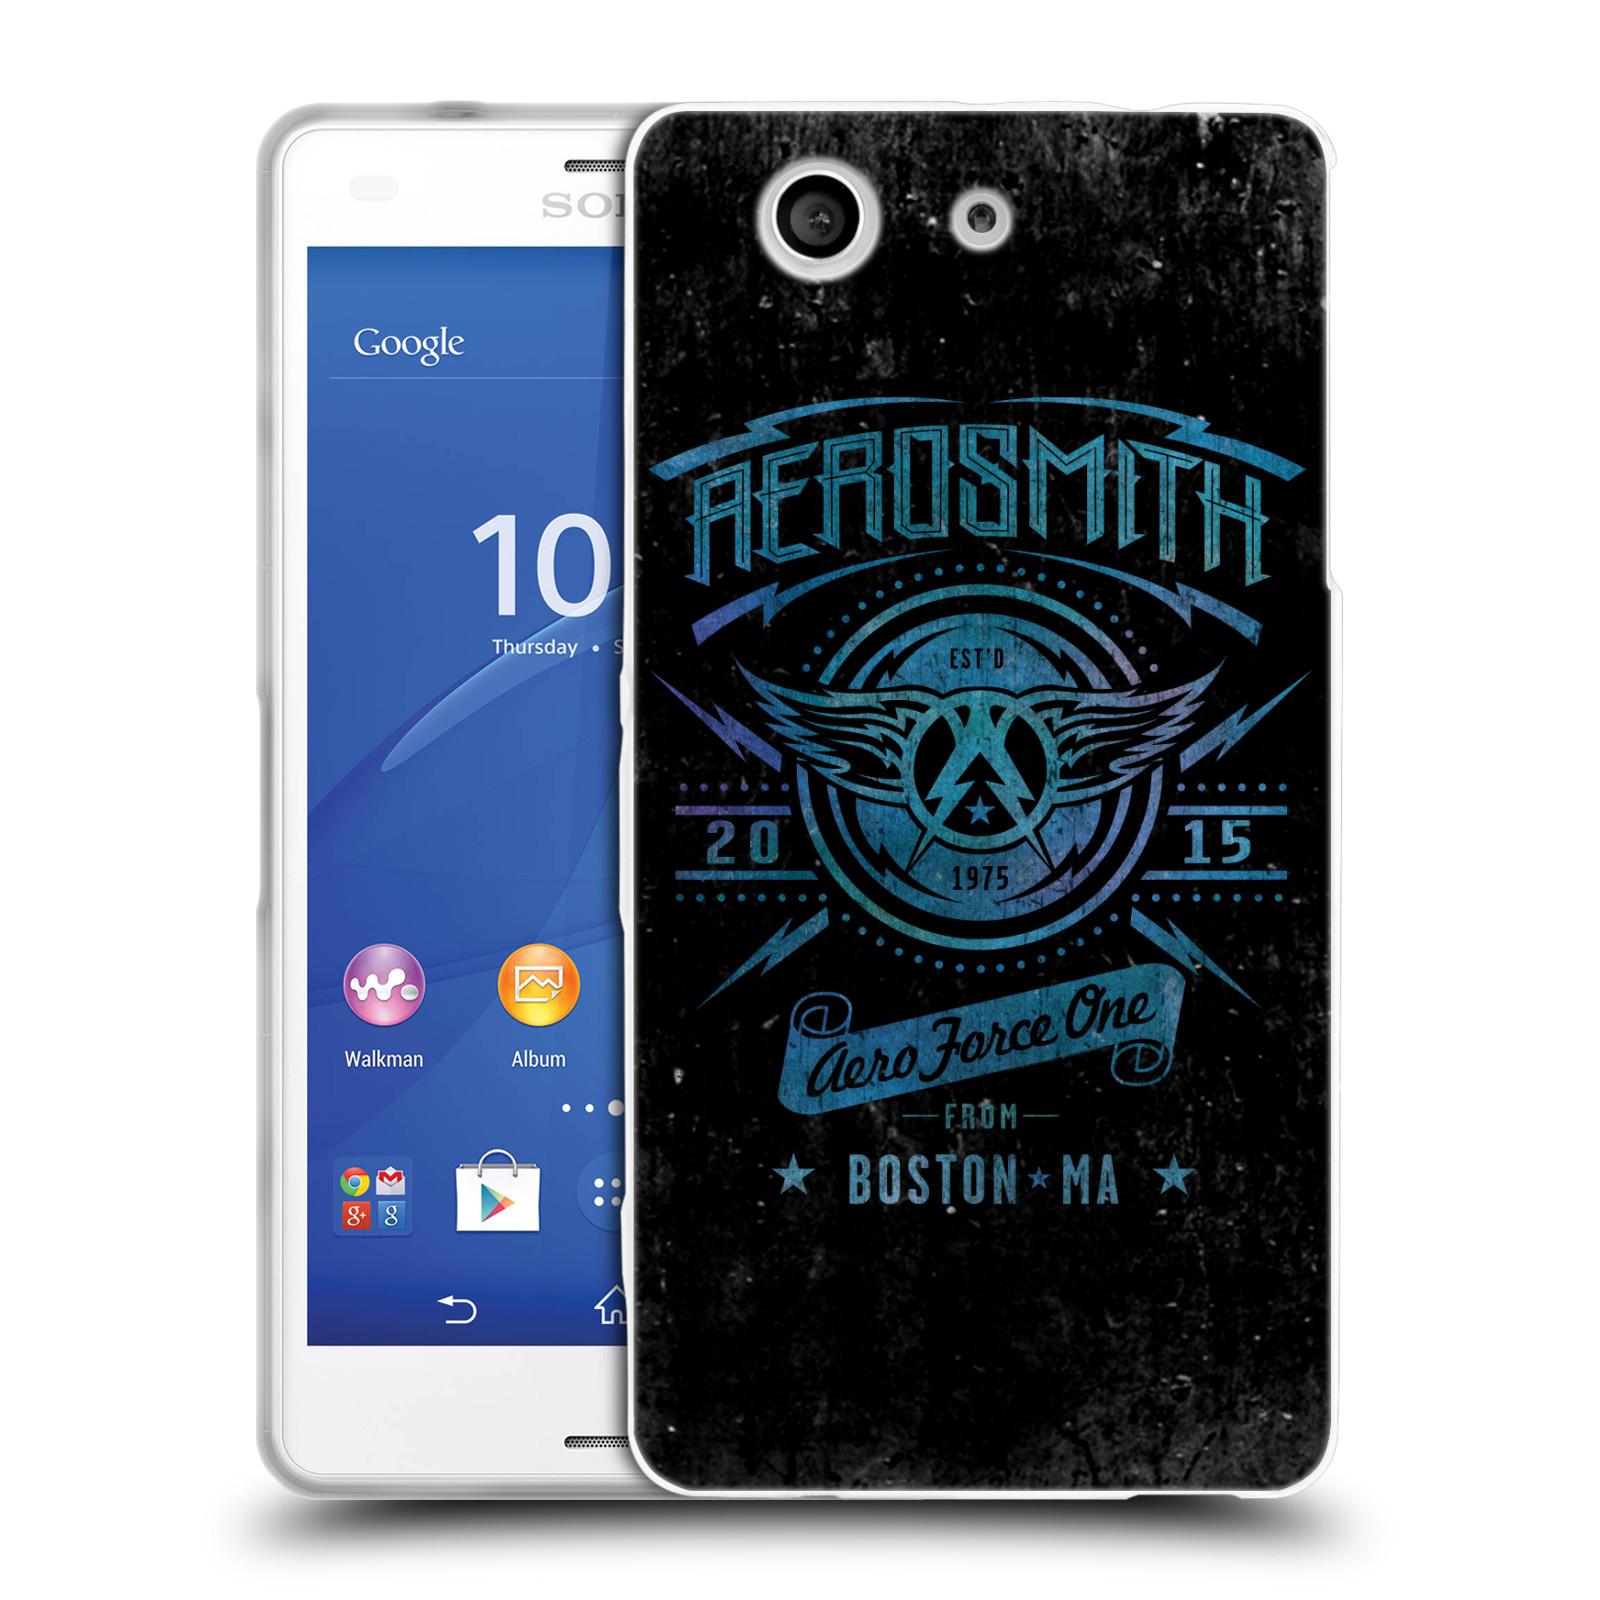 Silikonové pouzdro na mobil Sony Xperia Z3 Compact D5803 HEAD CASE - Aerosmith - Aero Force One